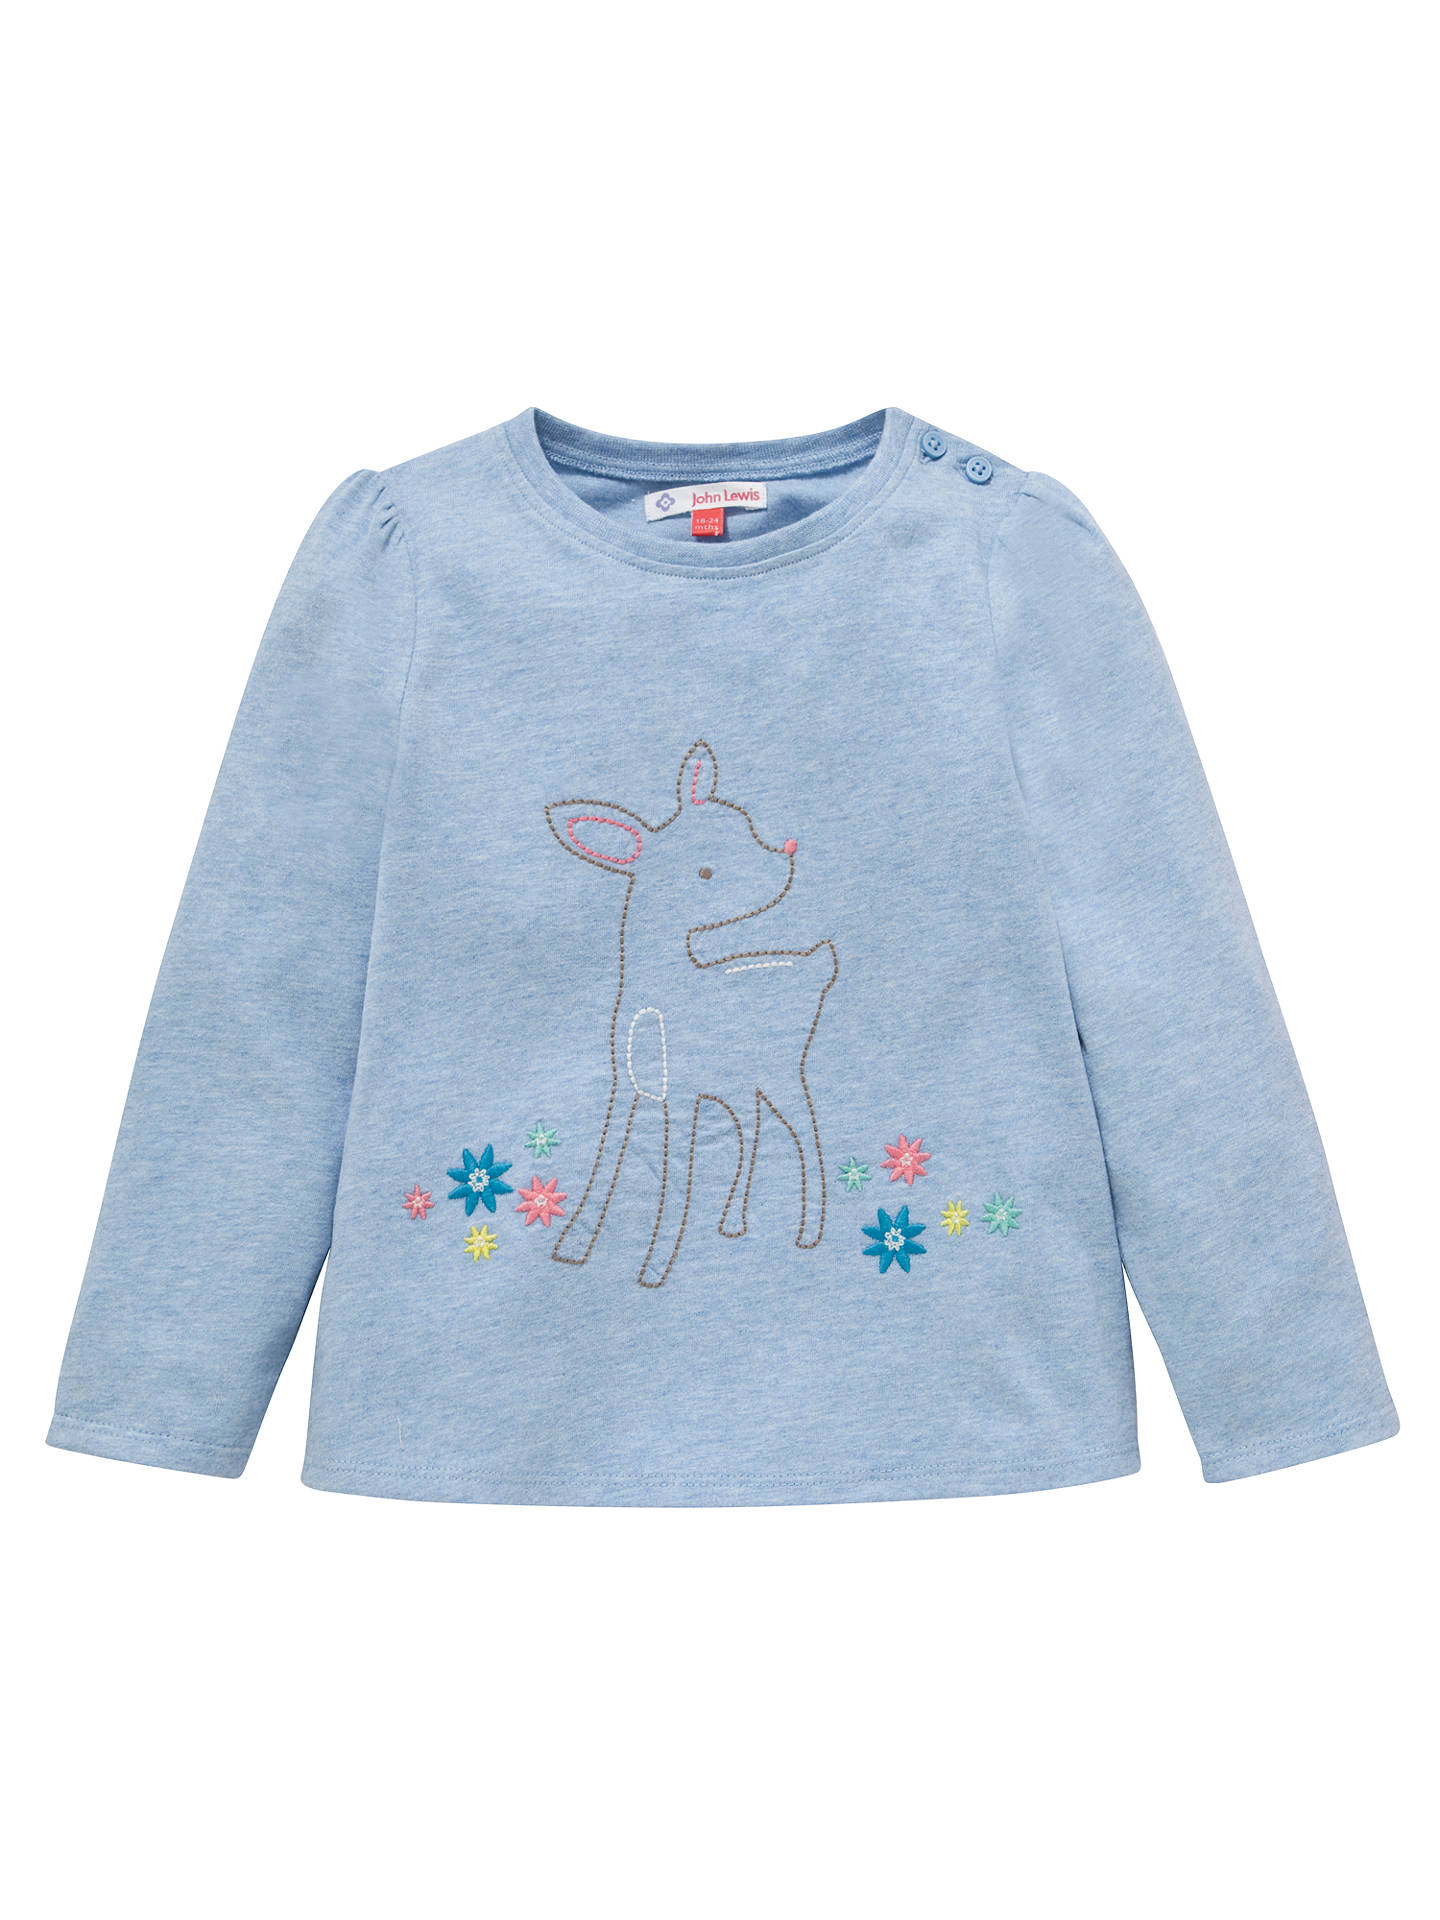 8cbd665185ca John Lewis Marl Stitched Deer T-Shirt